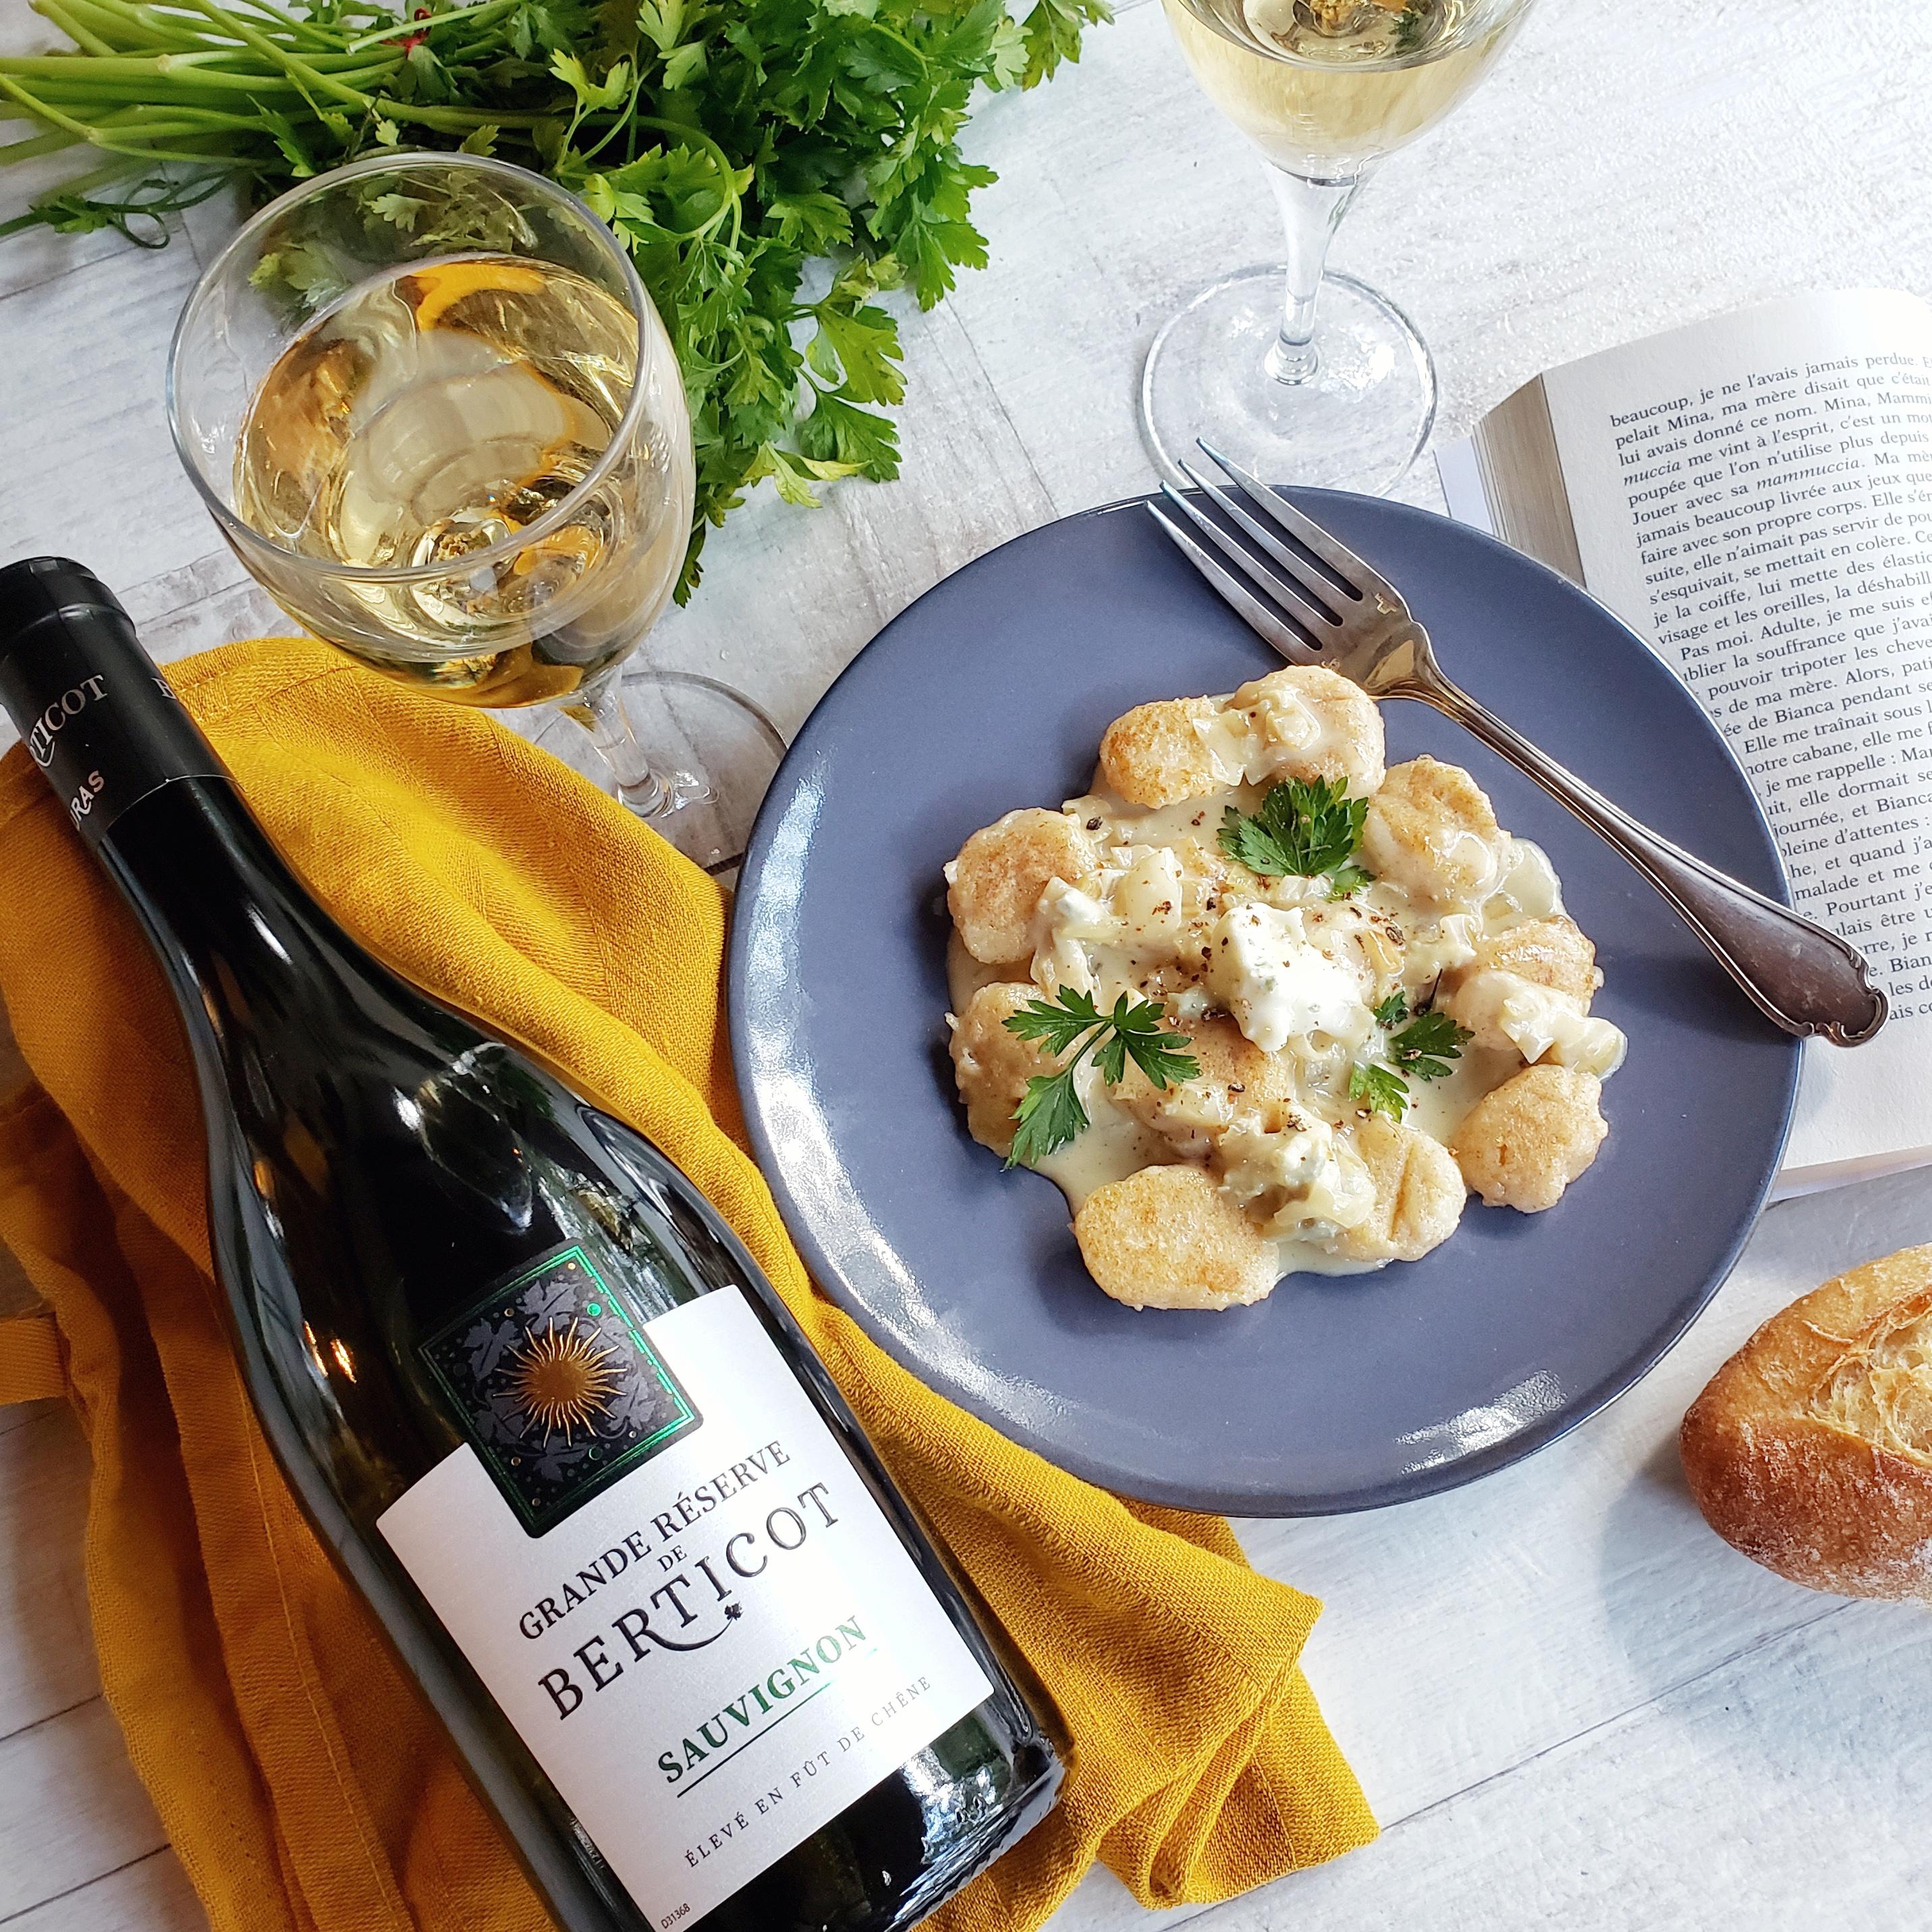 accord mets et vin Sauvignon Terre de Vignerons